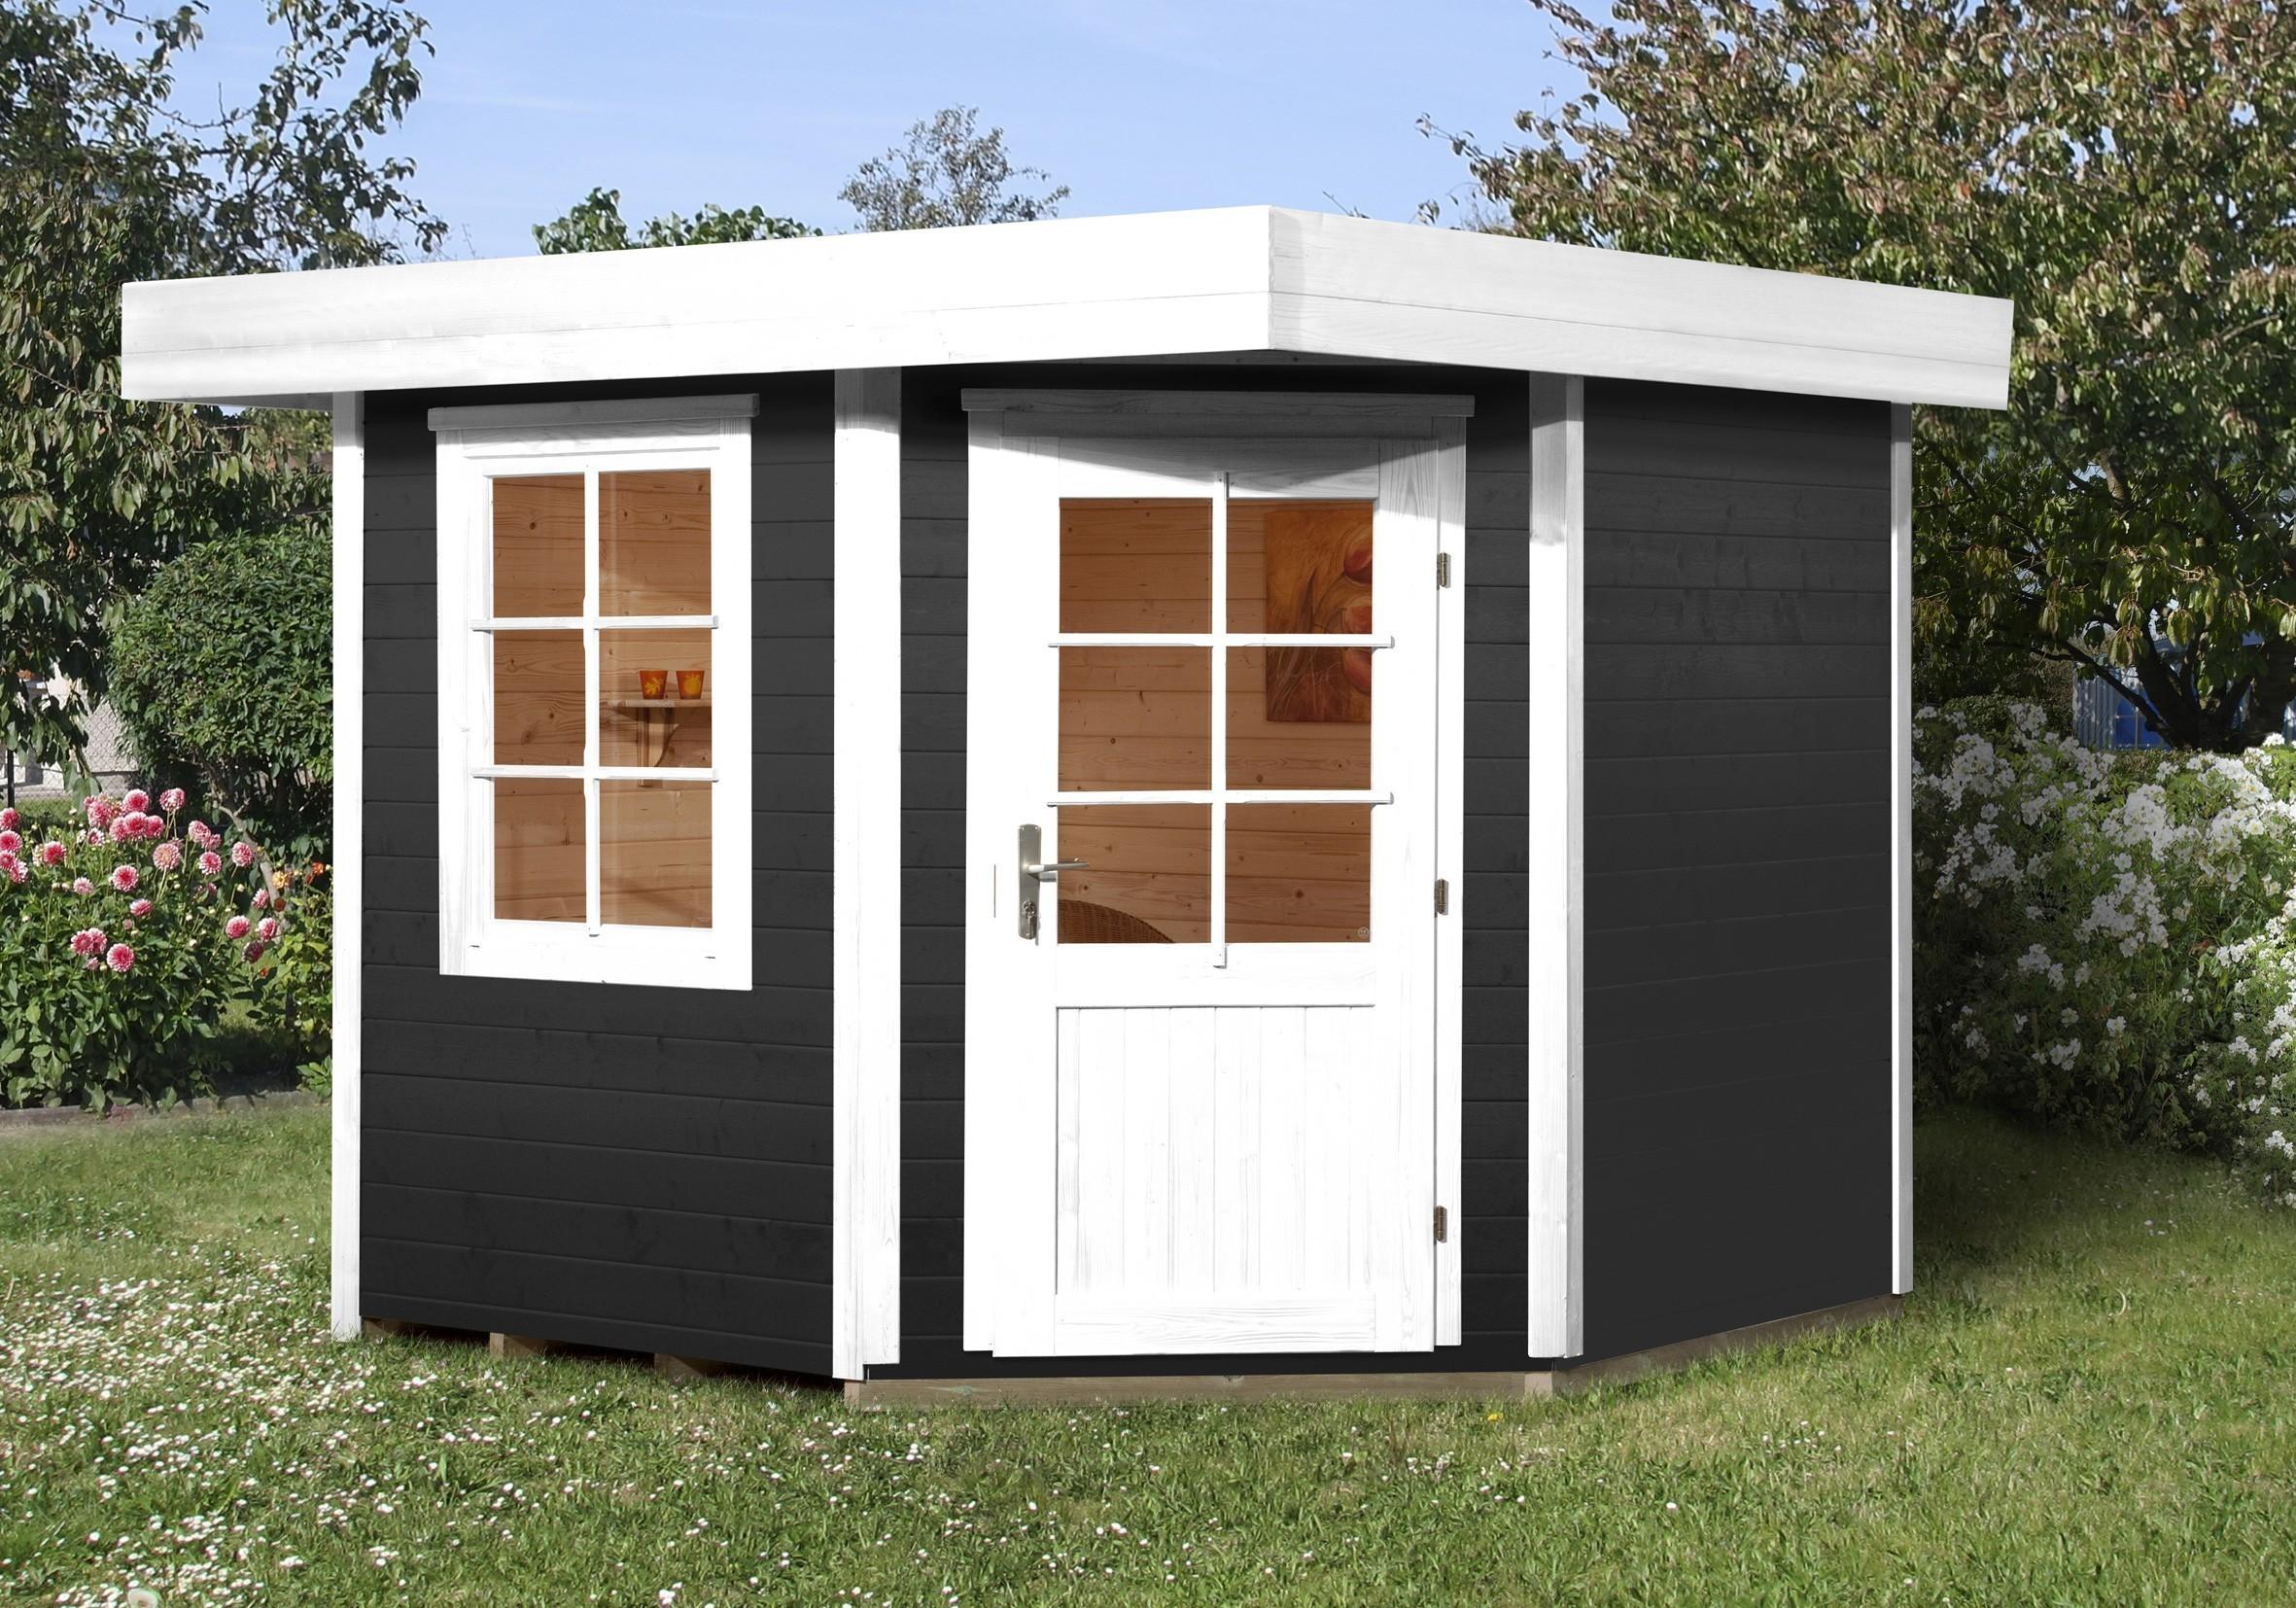 weka gartenhaus 28mm designhaus 213 gr 1 anthrazit 278x278cm vd 50cm bei. Black Bedroom Furniture Sets. Home Design Ideas